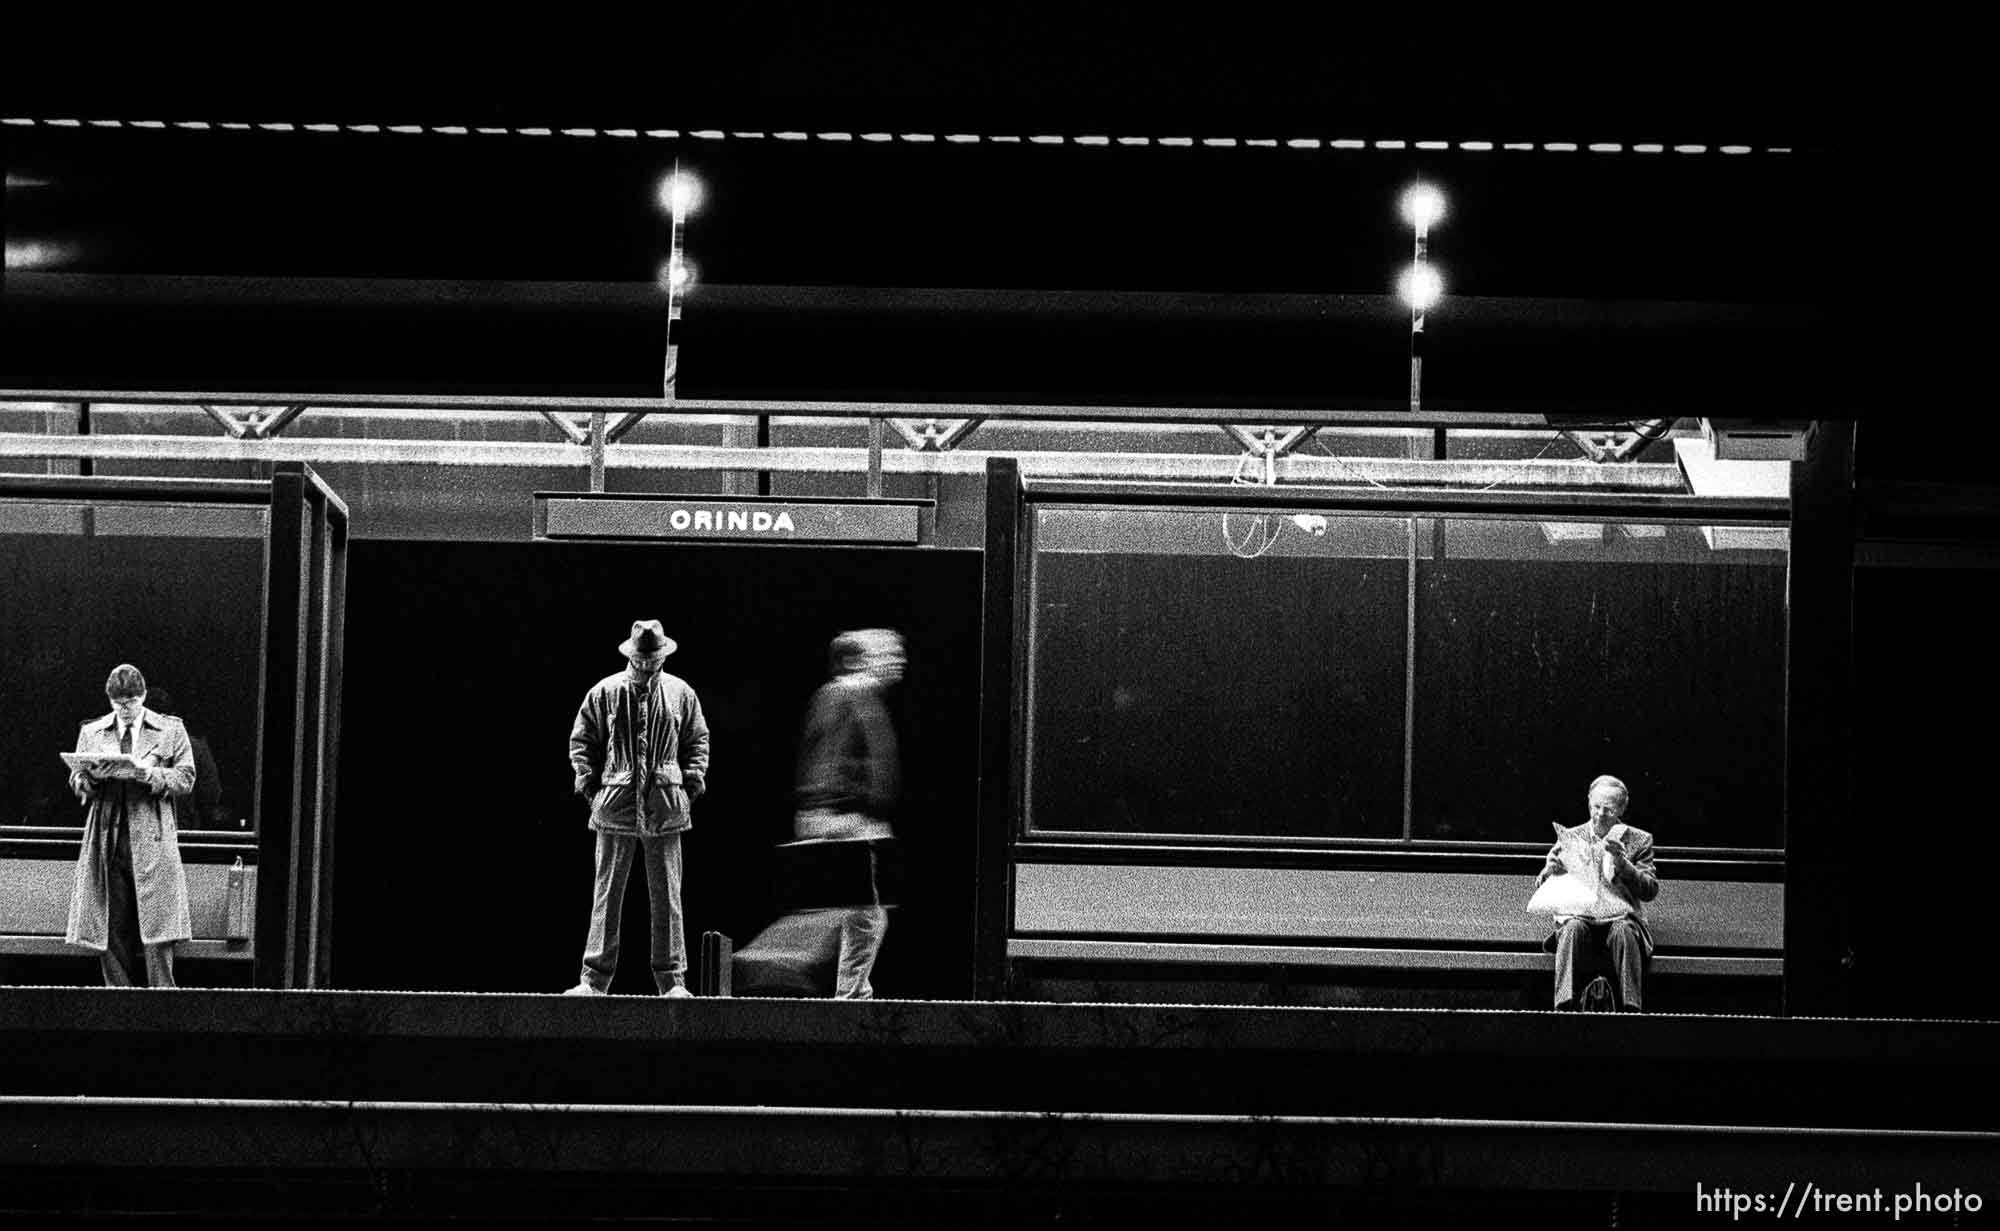 Commuters waiting for BART train before sunrise